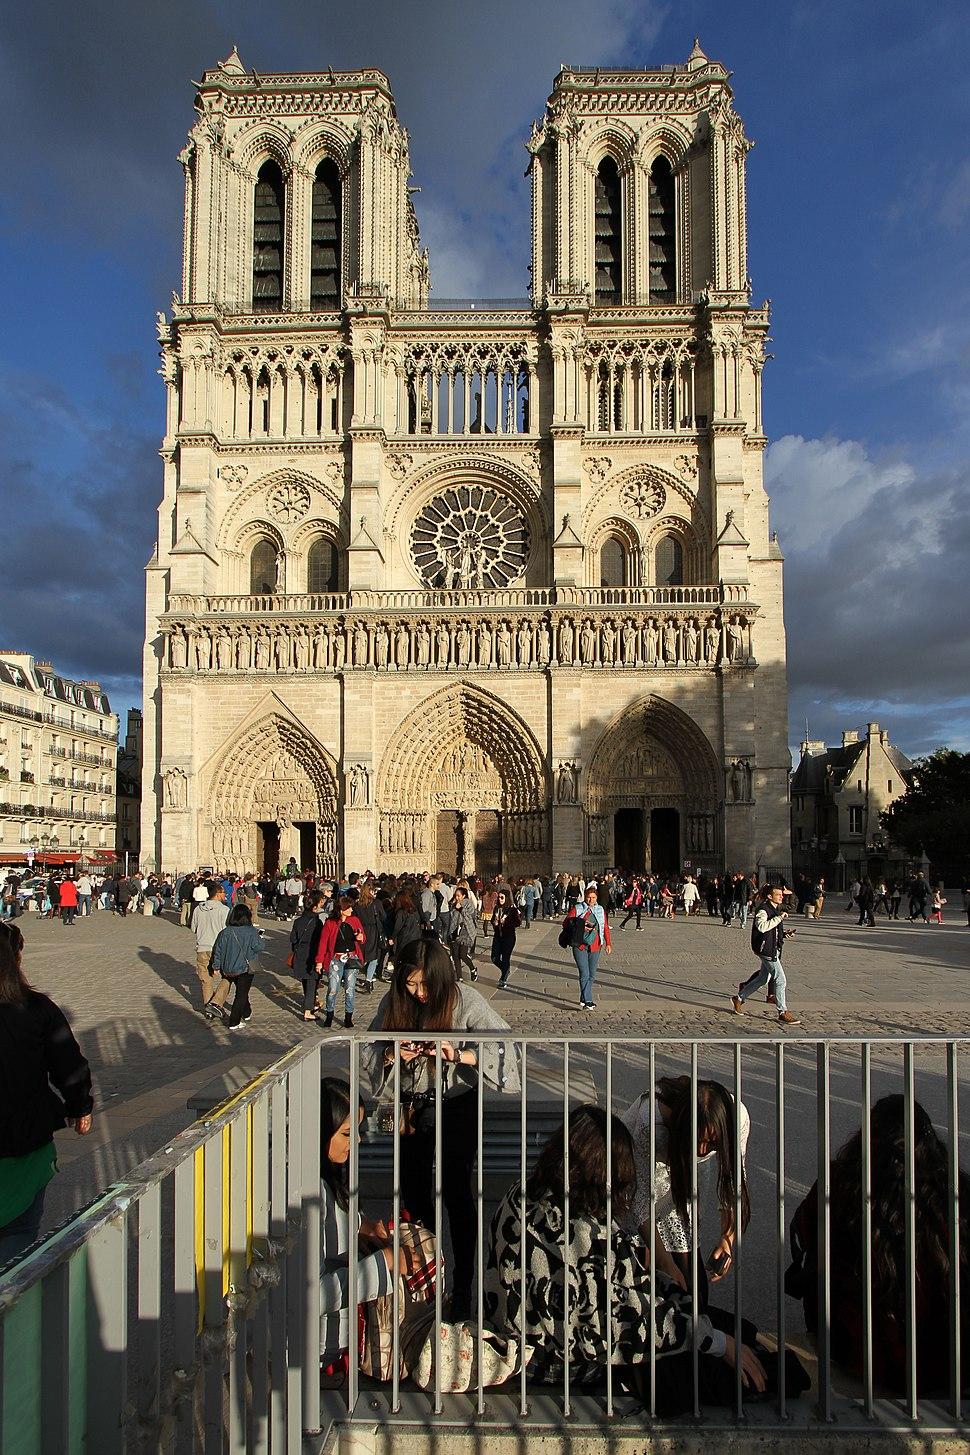 Paris-Notre Dame-110-Westfassade-2017-gje